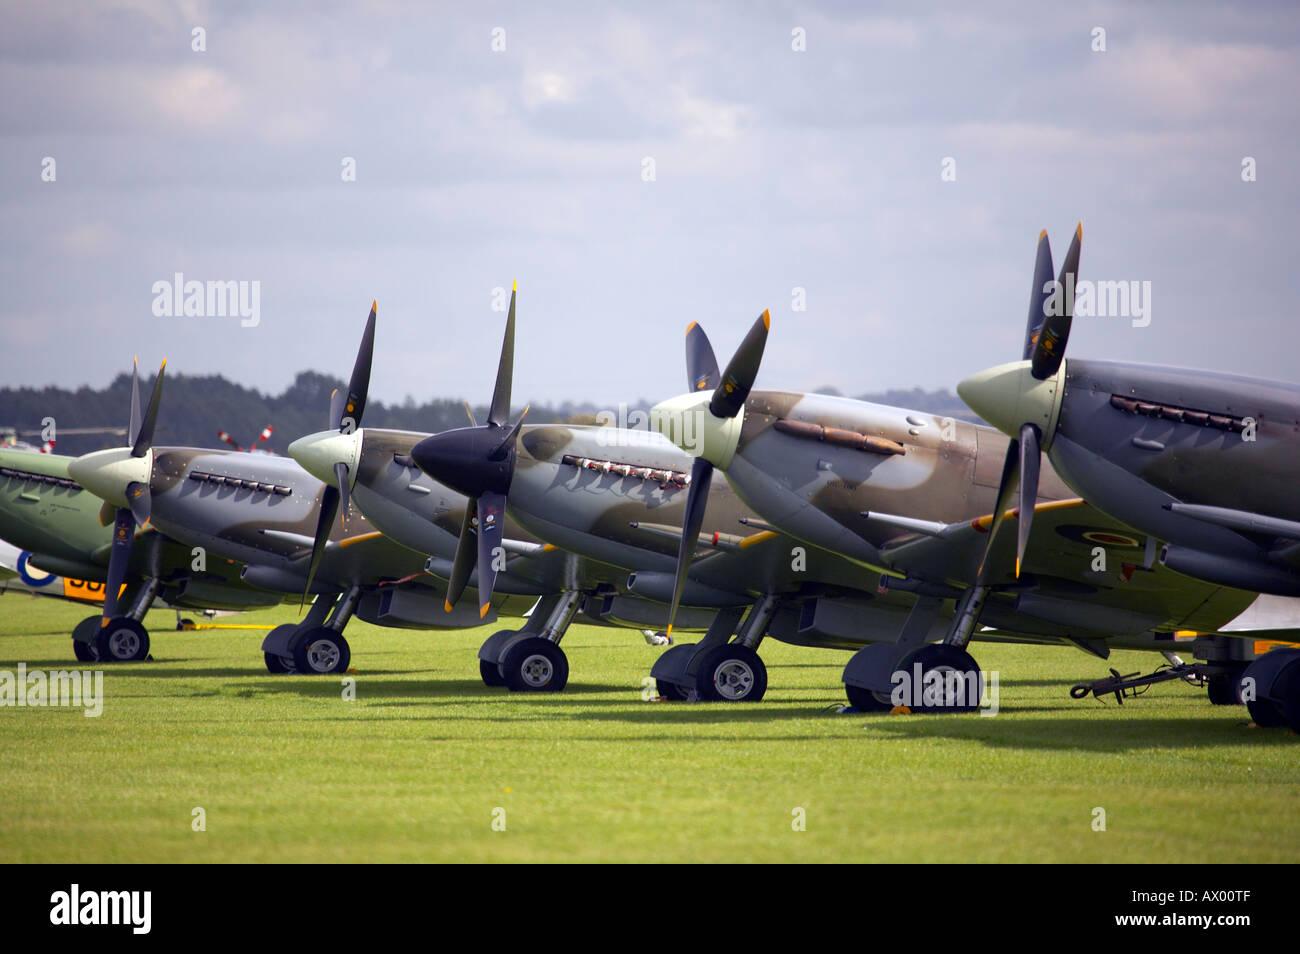 Line of Spitfires on runway at Duxford aerodrome UK - Stock Image